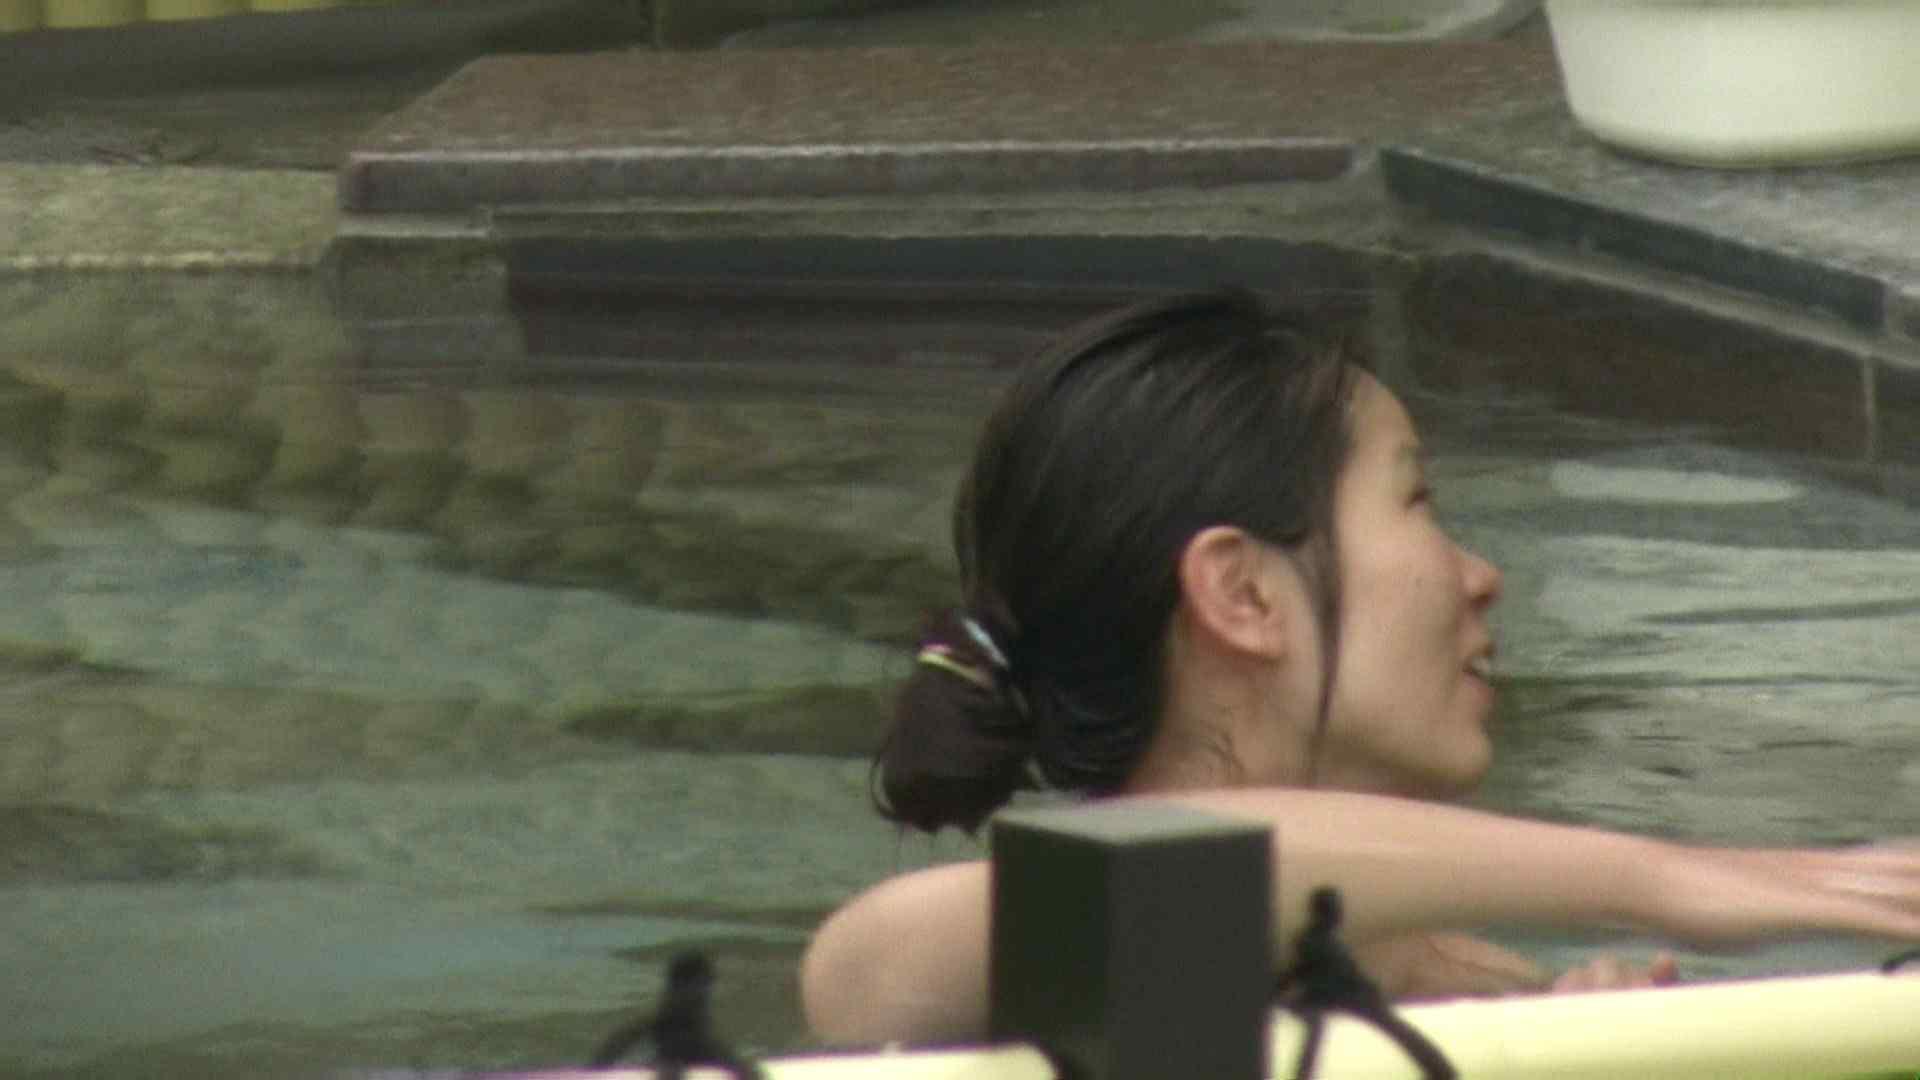 Aquaな露天風呂Vol.07 盗撮シリーズ   露天風呂編  94PIX 39